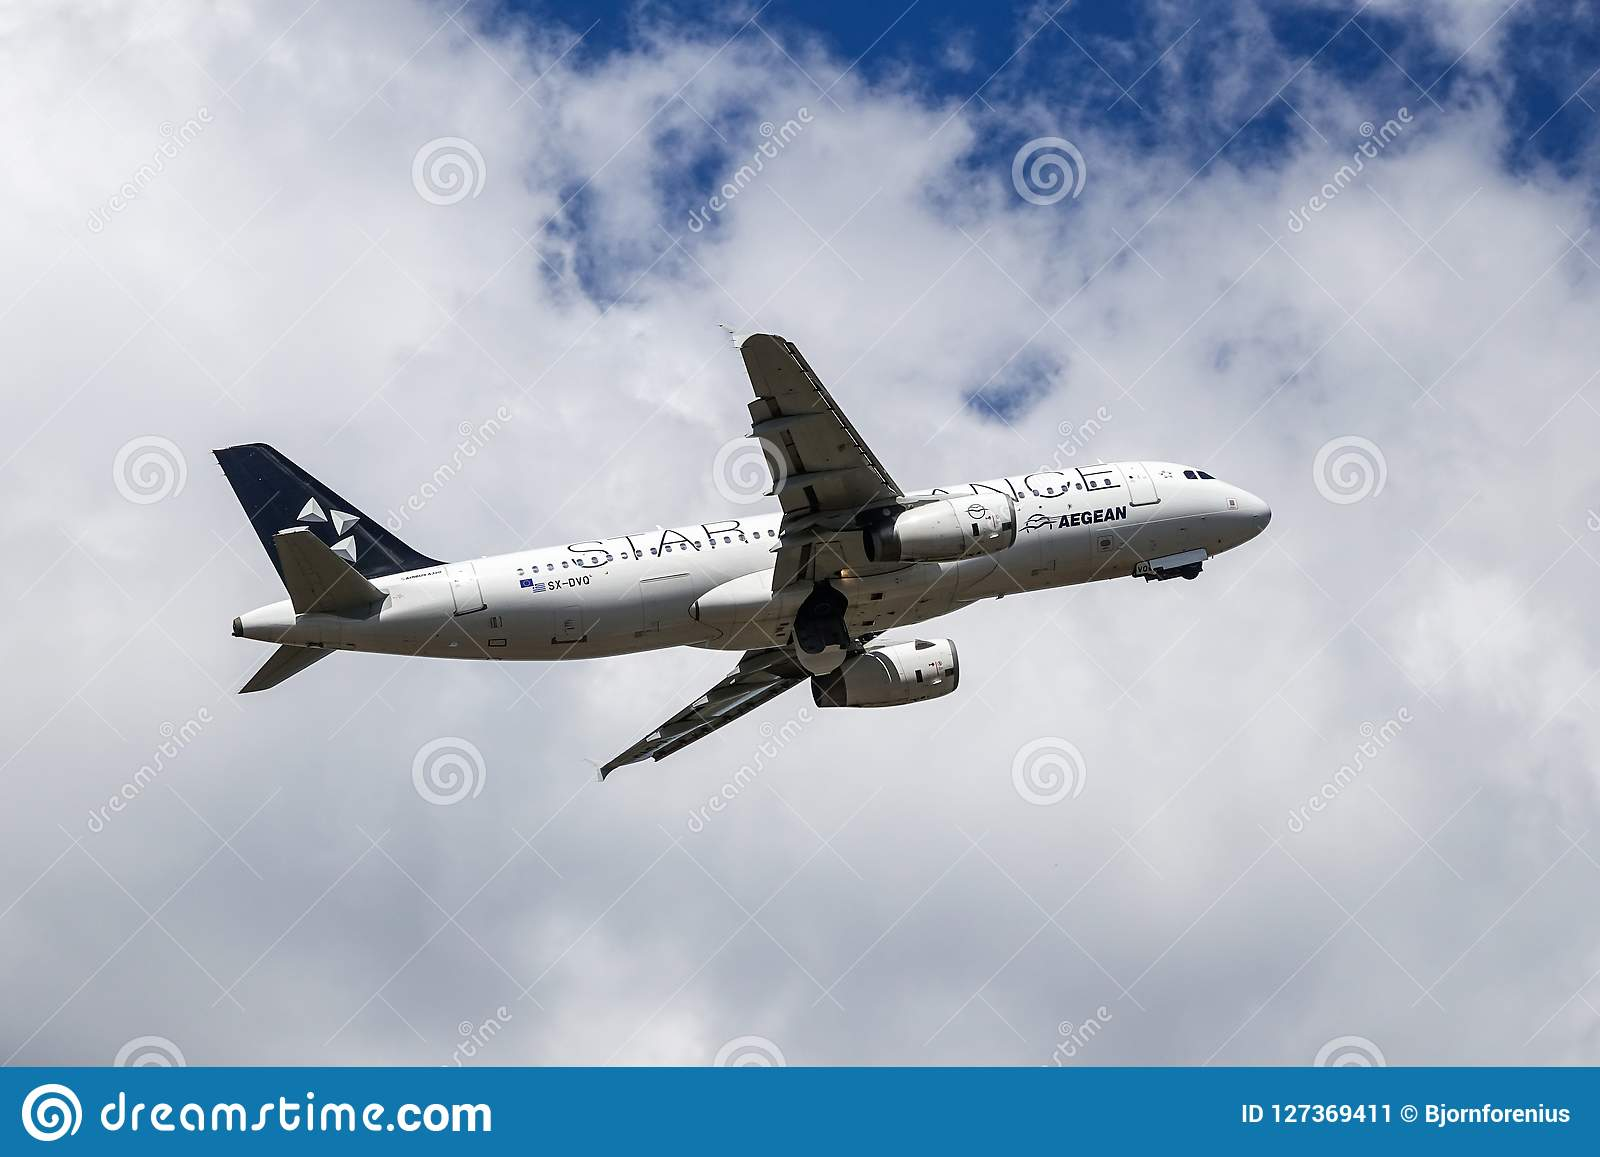 Aegean Airlines, Star Alliance, Airbus A320 - 200 decolam